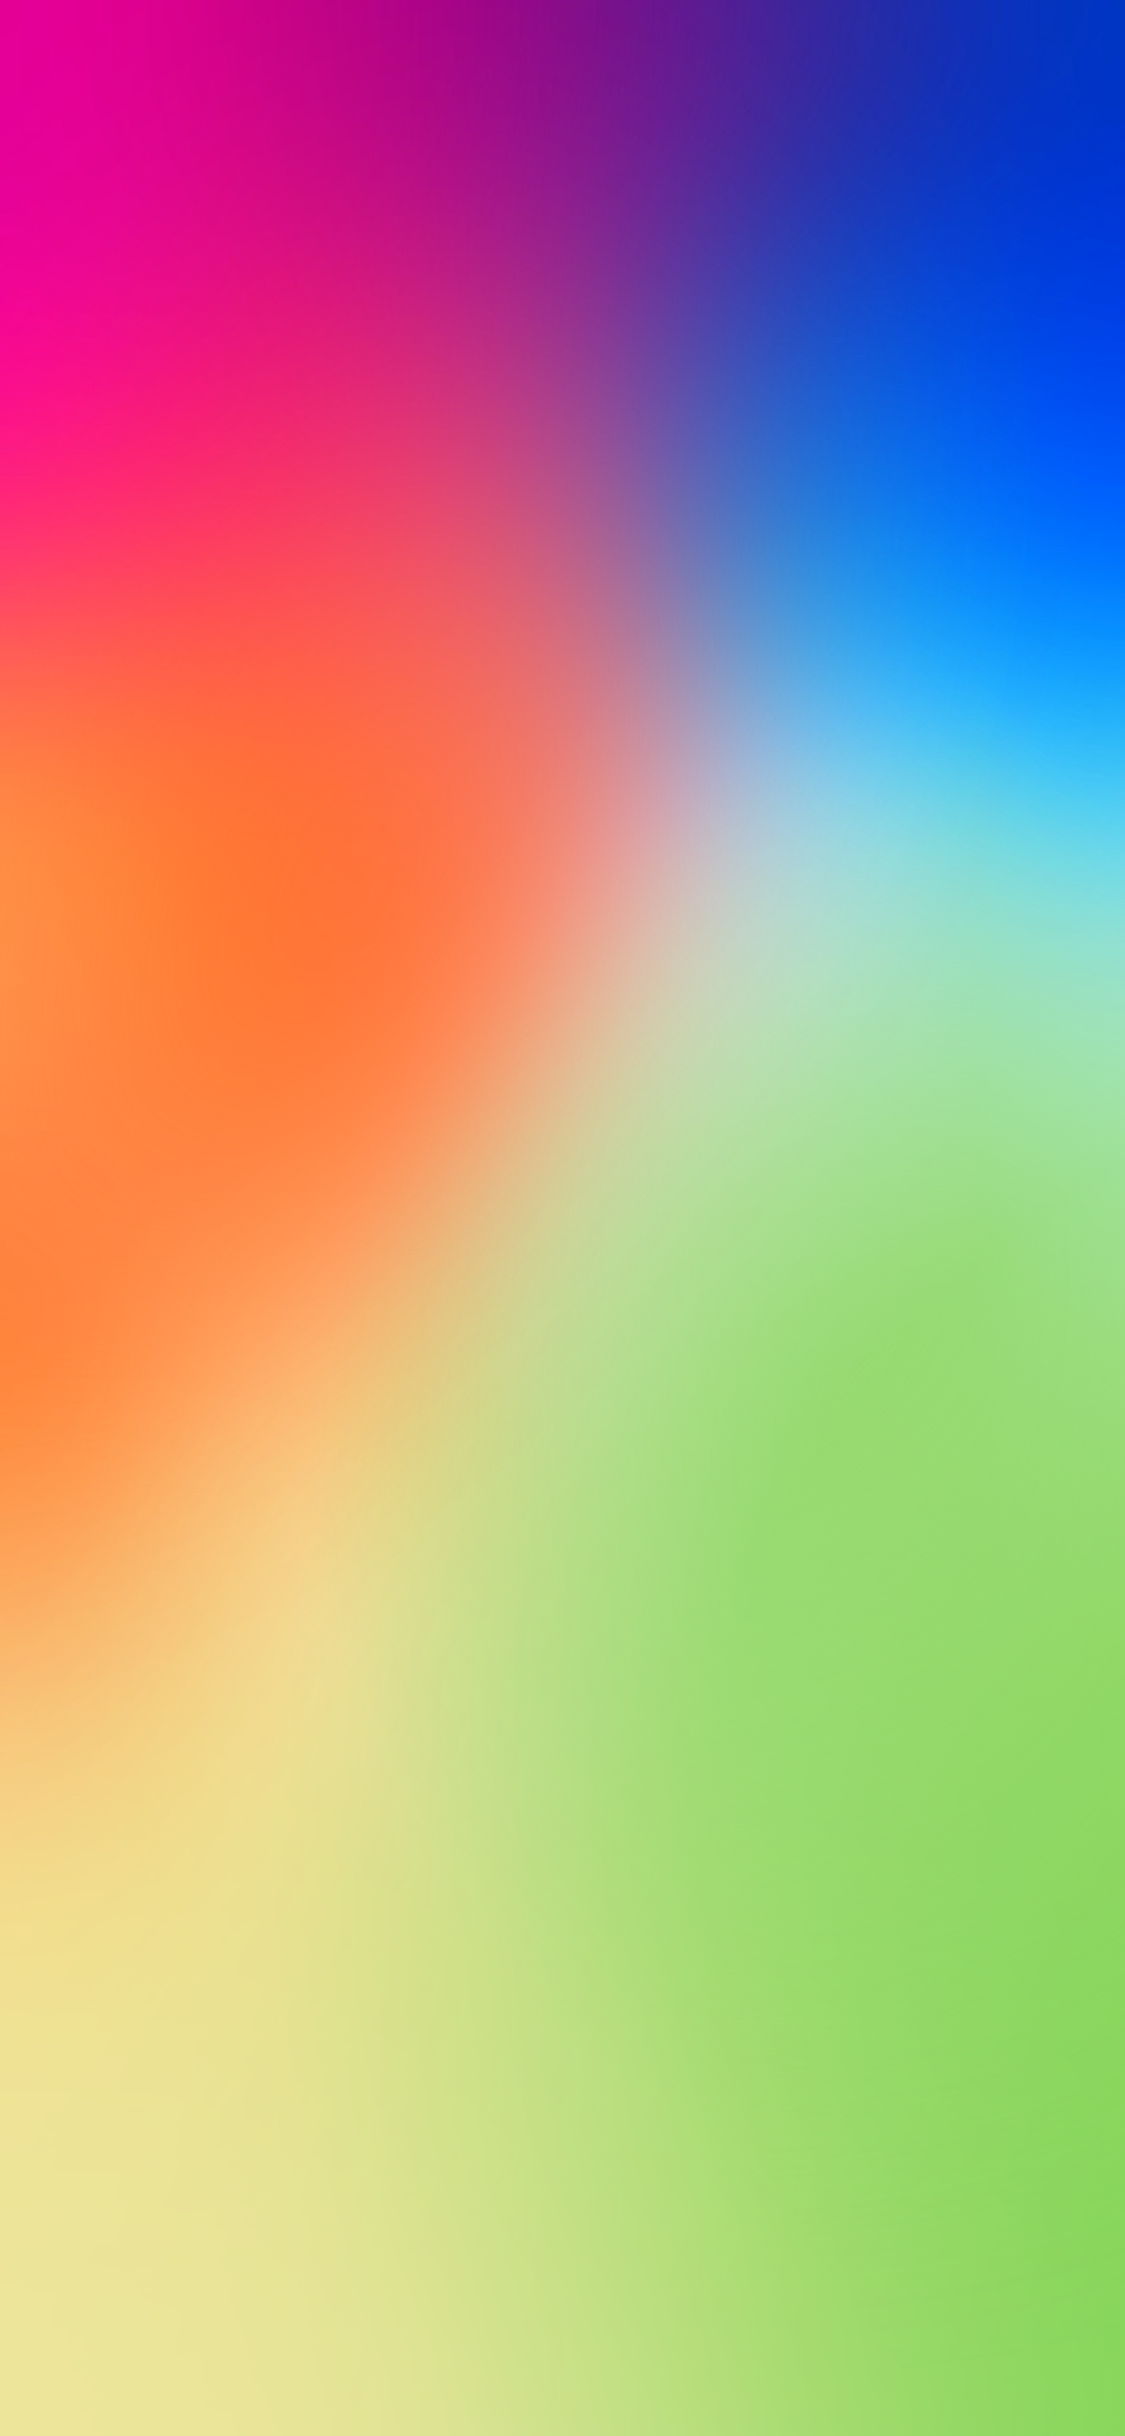 Fondo De Pantalla Para Iphone X Iphone Xs Wallpaper Iphone Neon Iphone Wallpaper Android Wallpaper